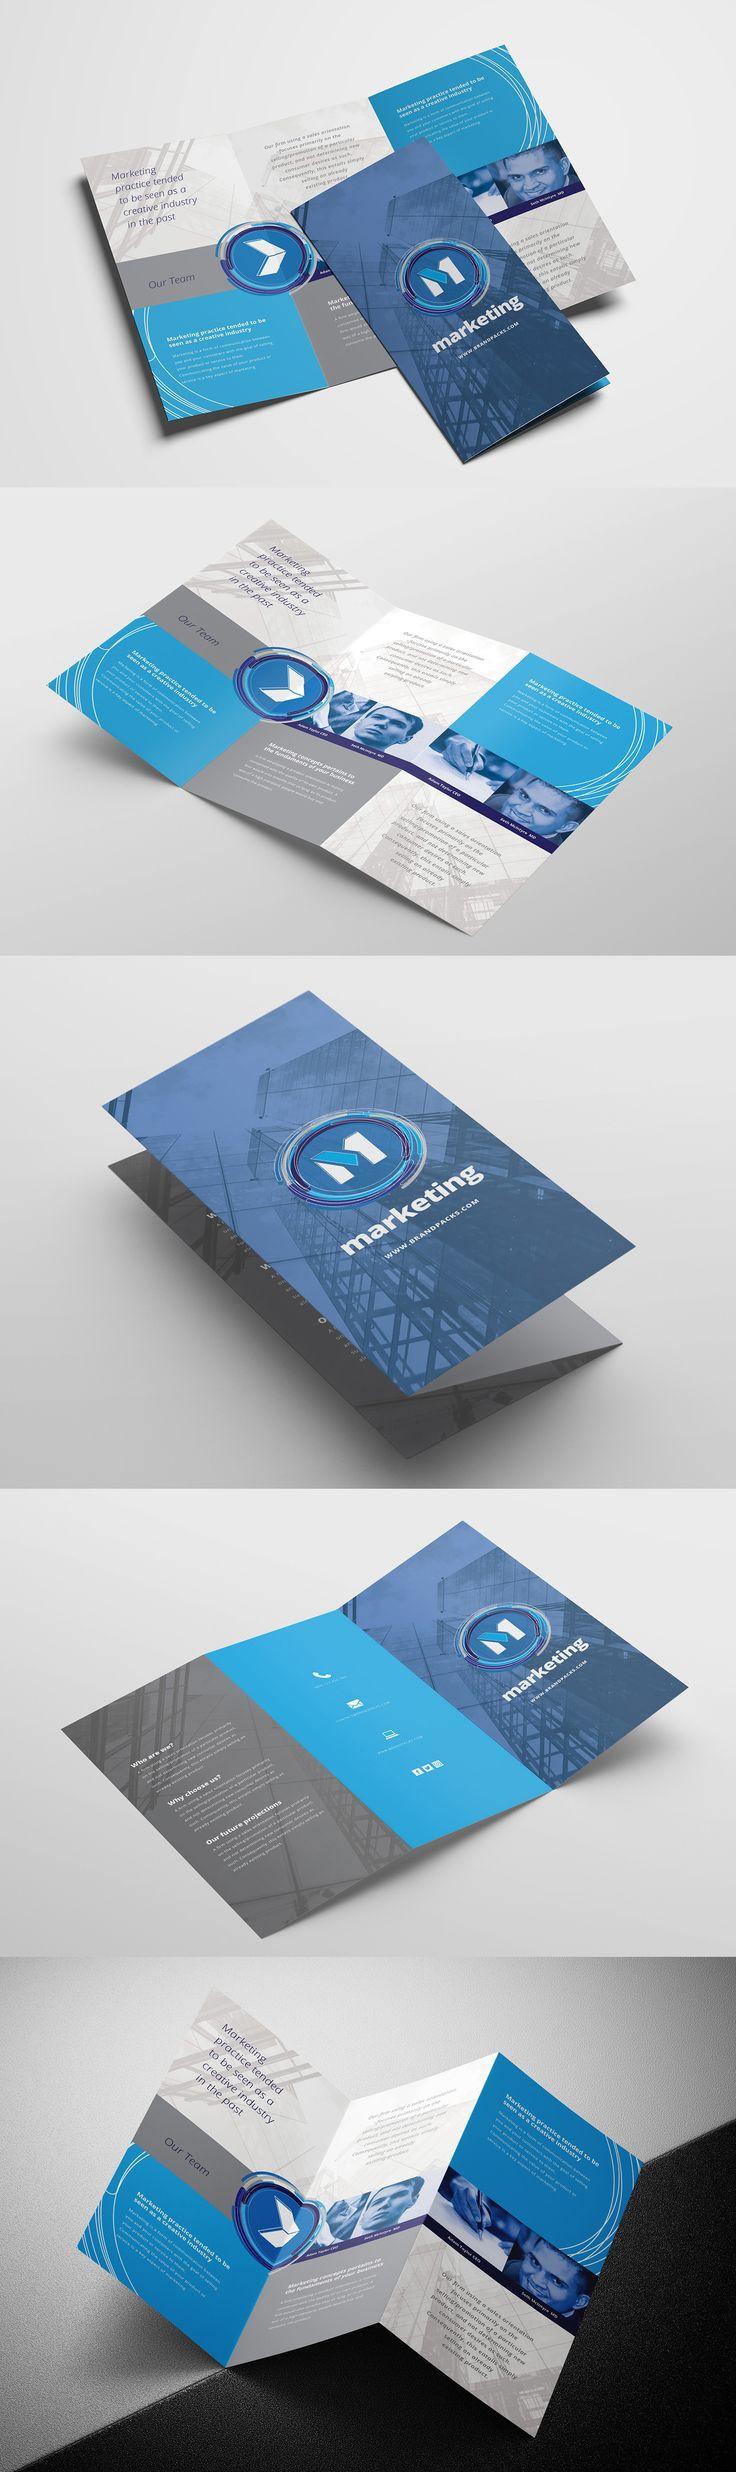 13 best Free Tri-Fold Brochure Templates images on Pinterest ...